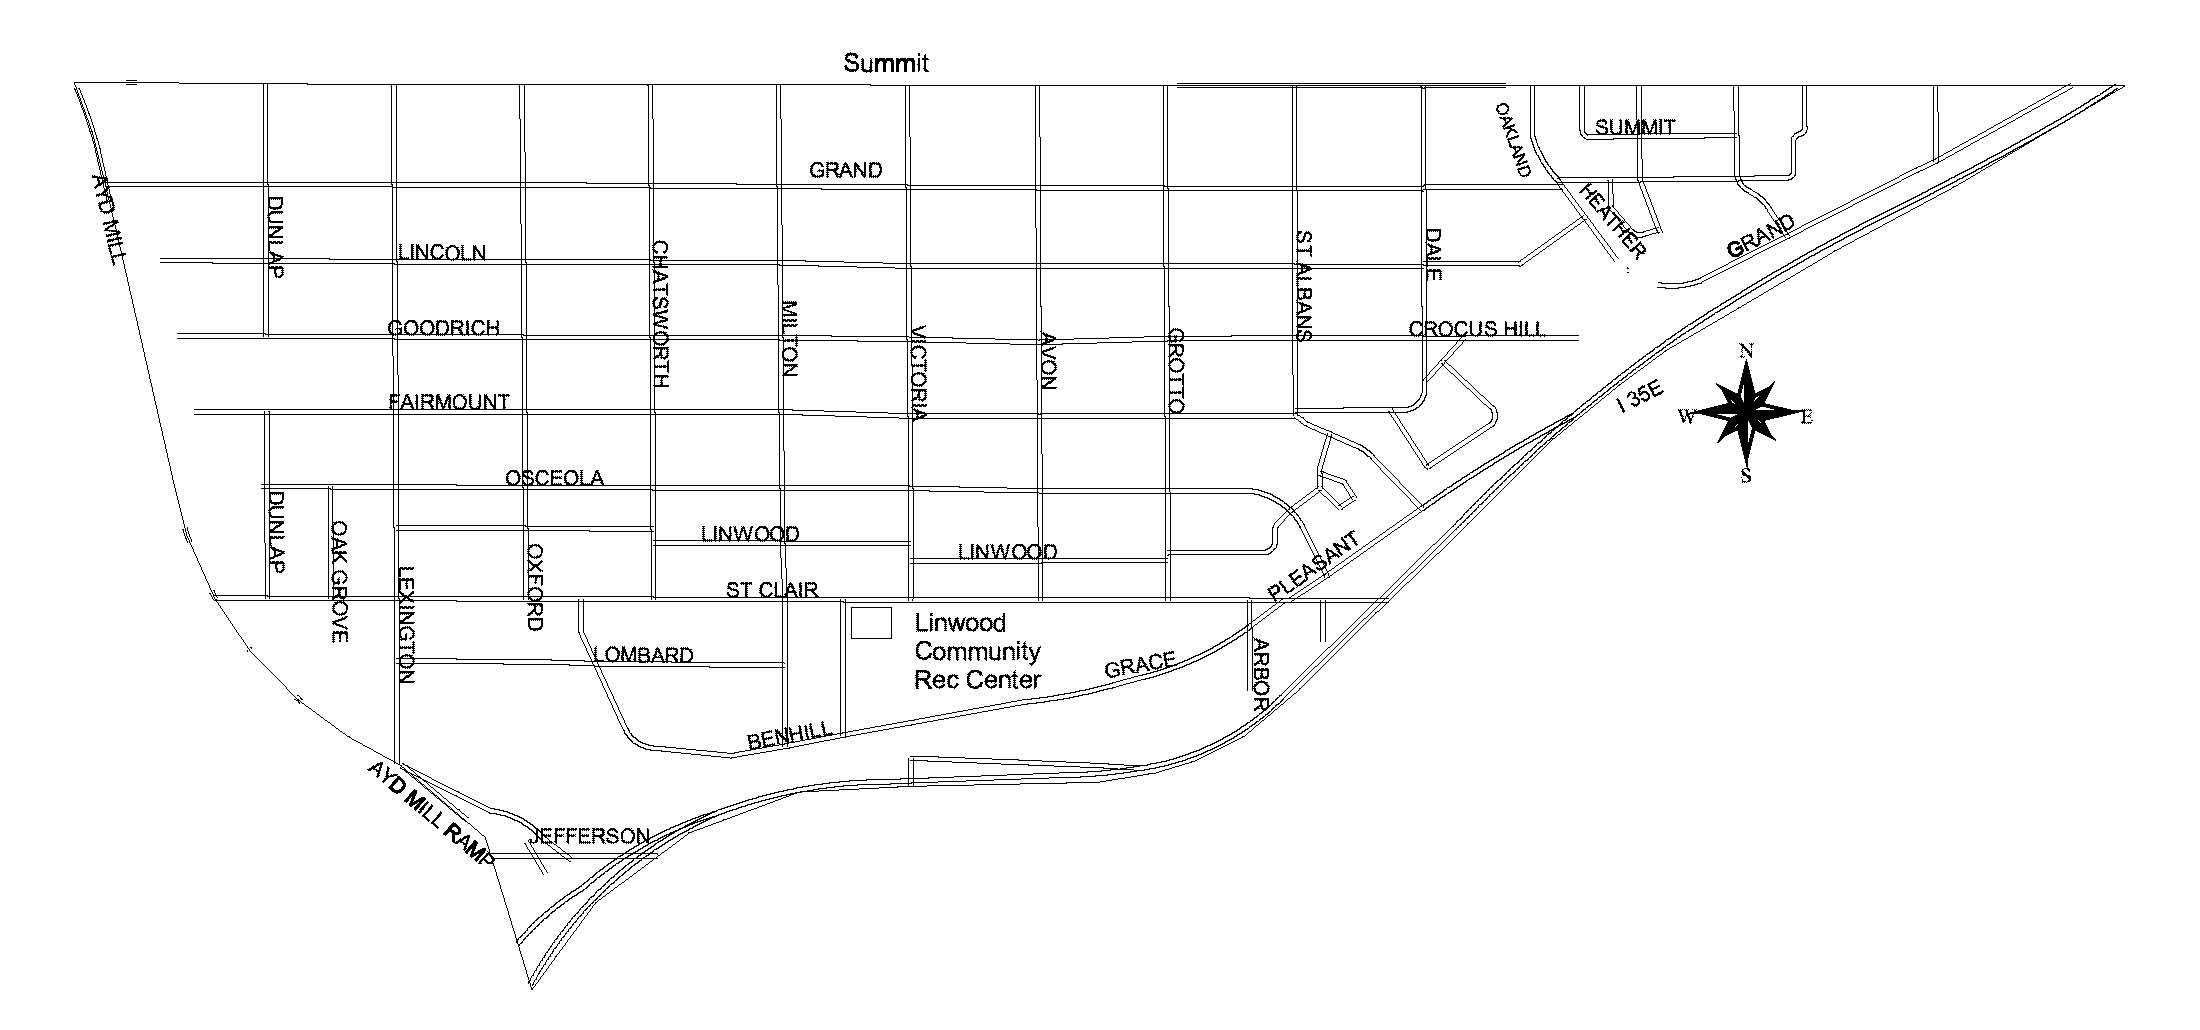 about_districtmap.jpg